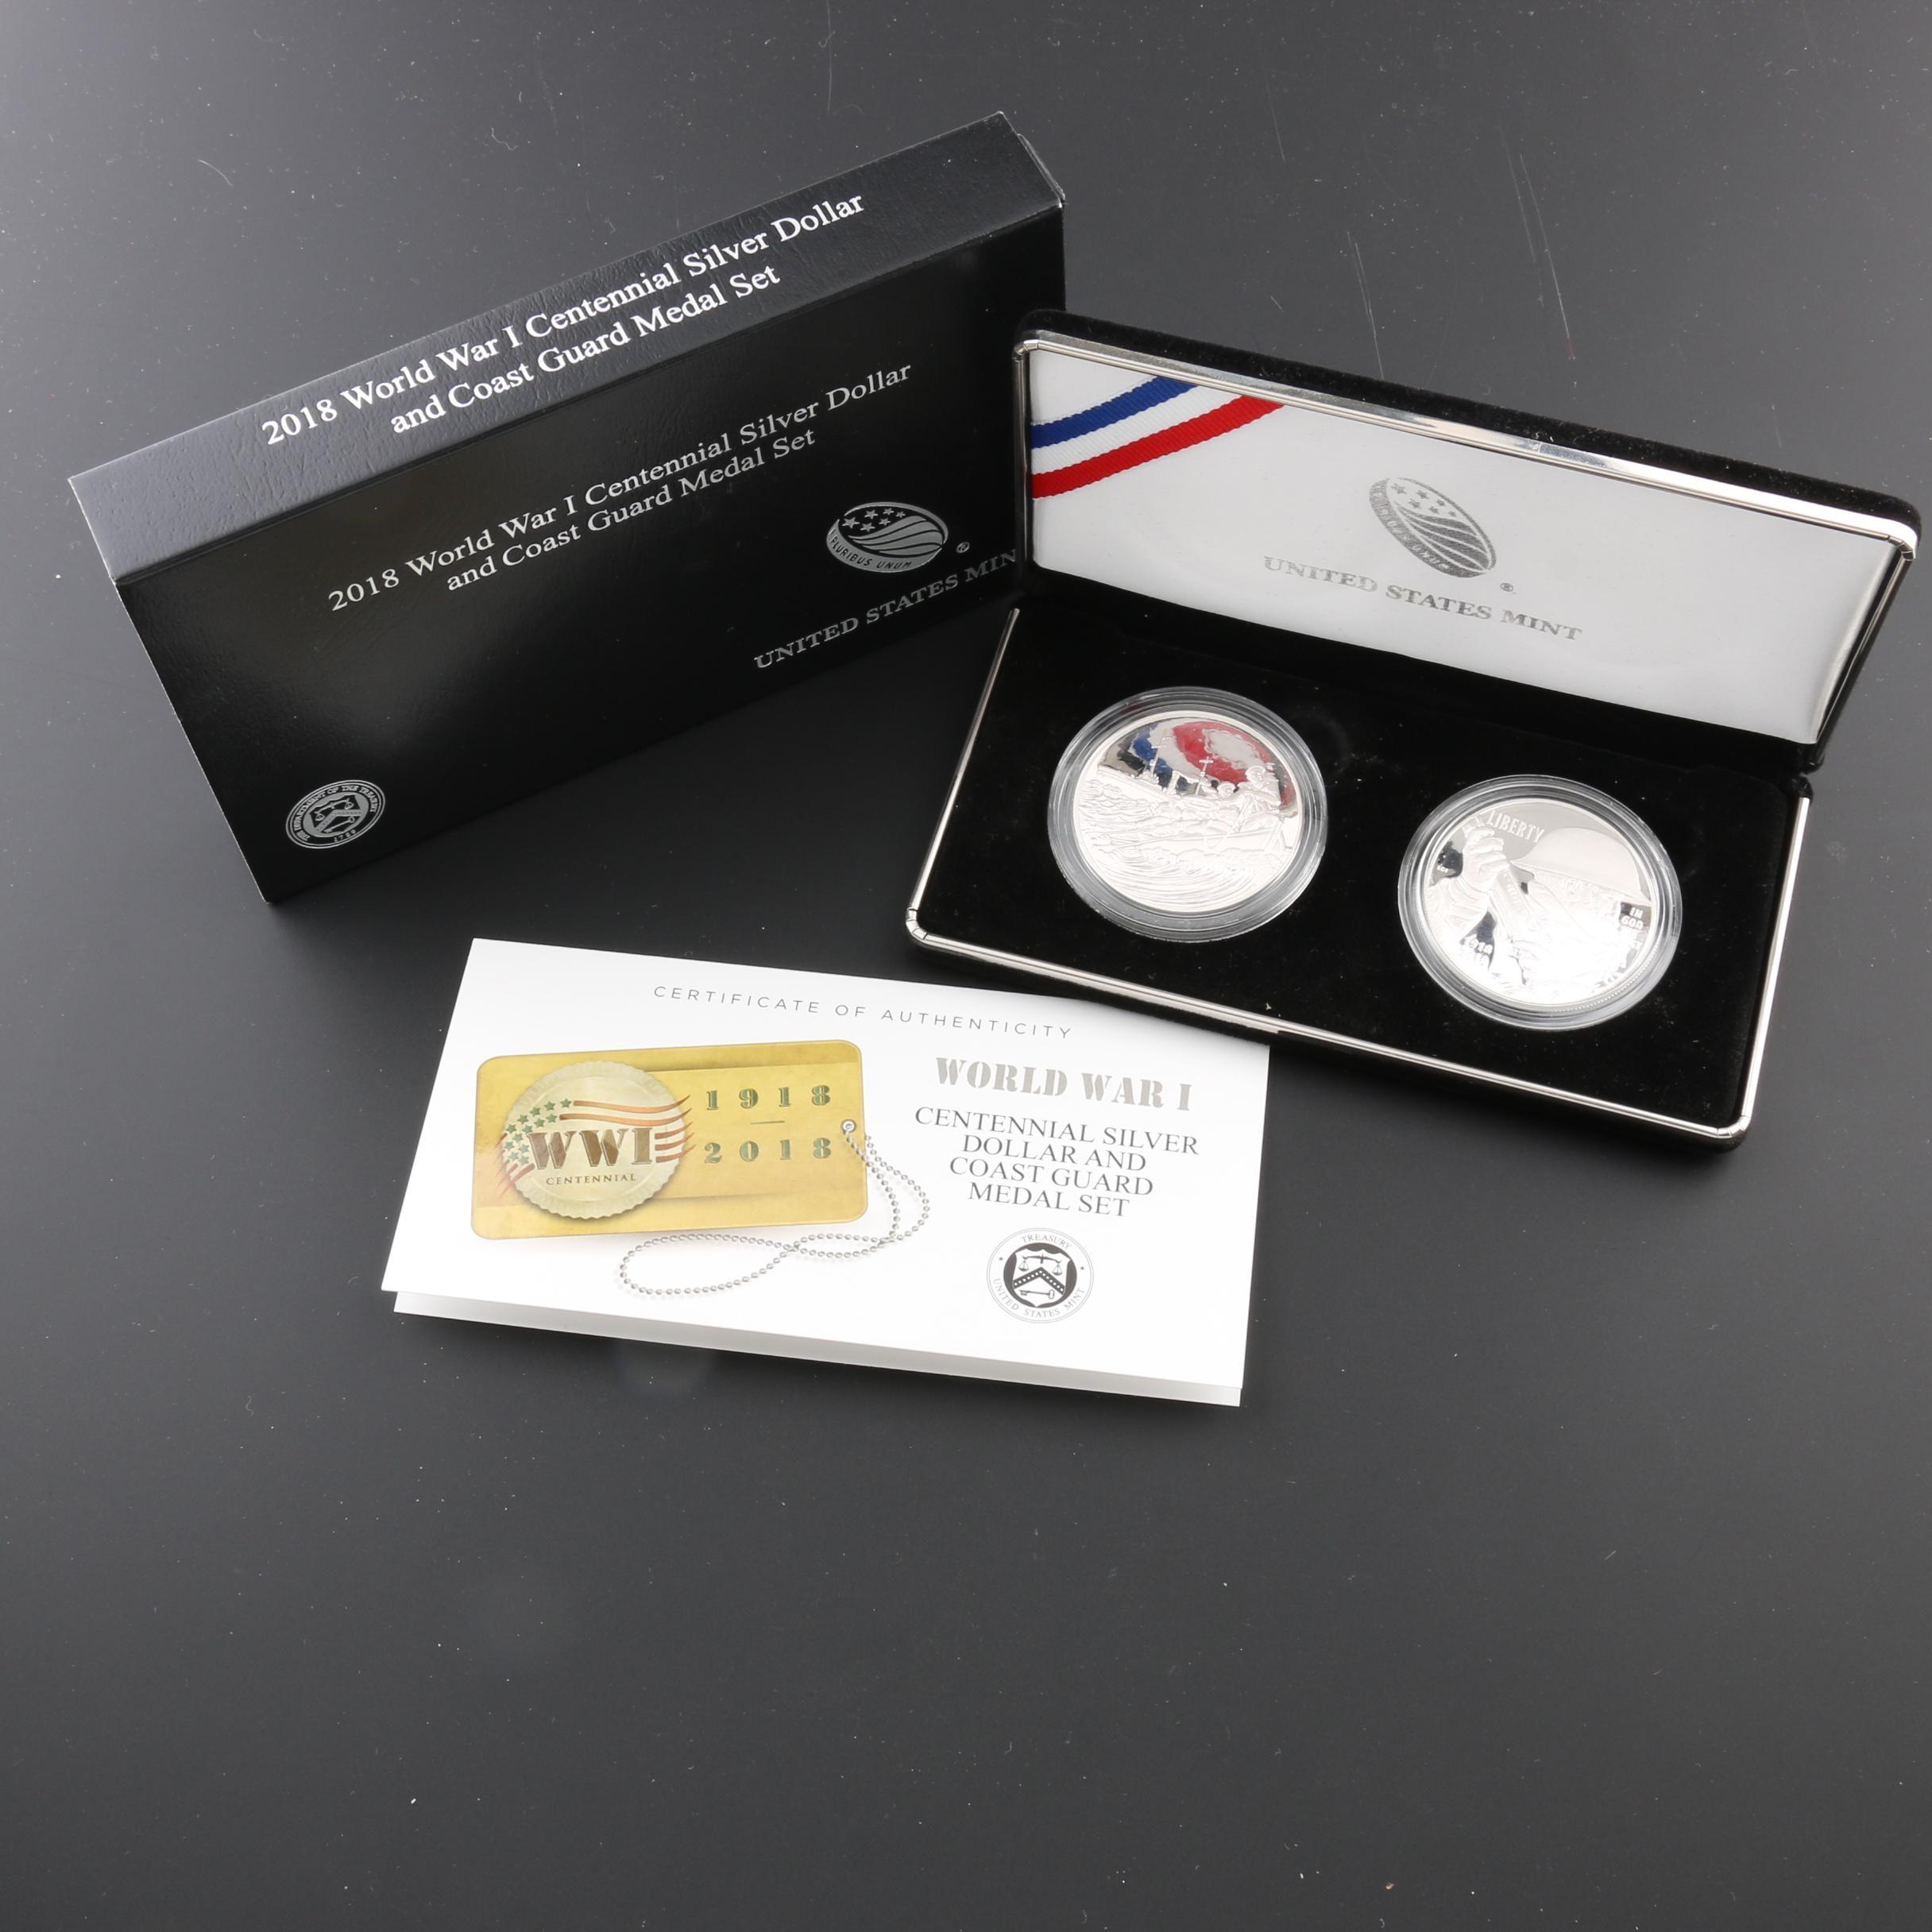 2018 World War I Centennial Silver Dollar and Coast Guard Medal Proof Set